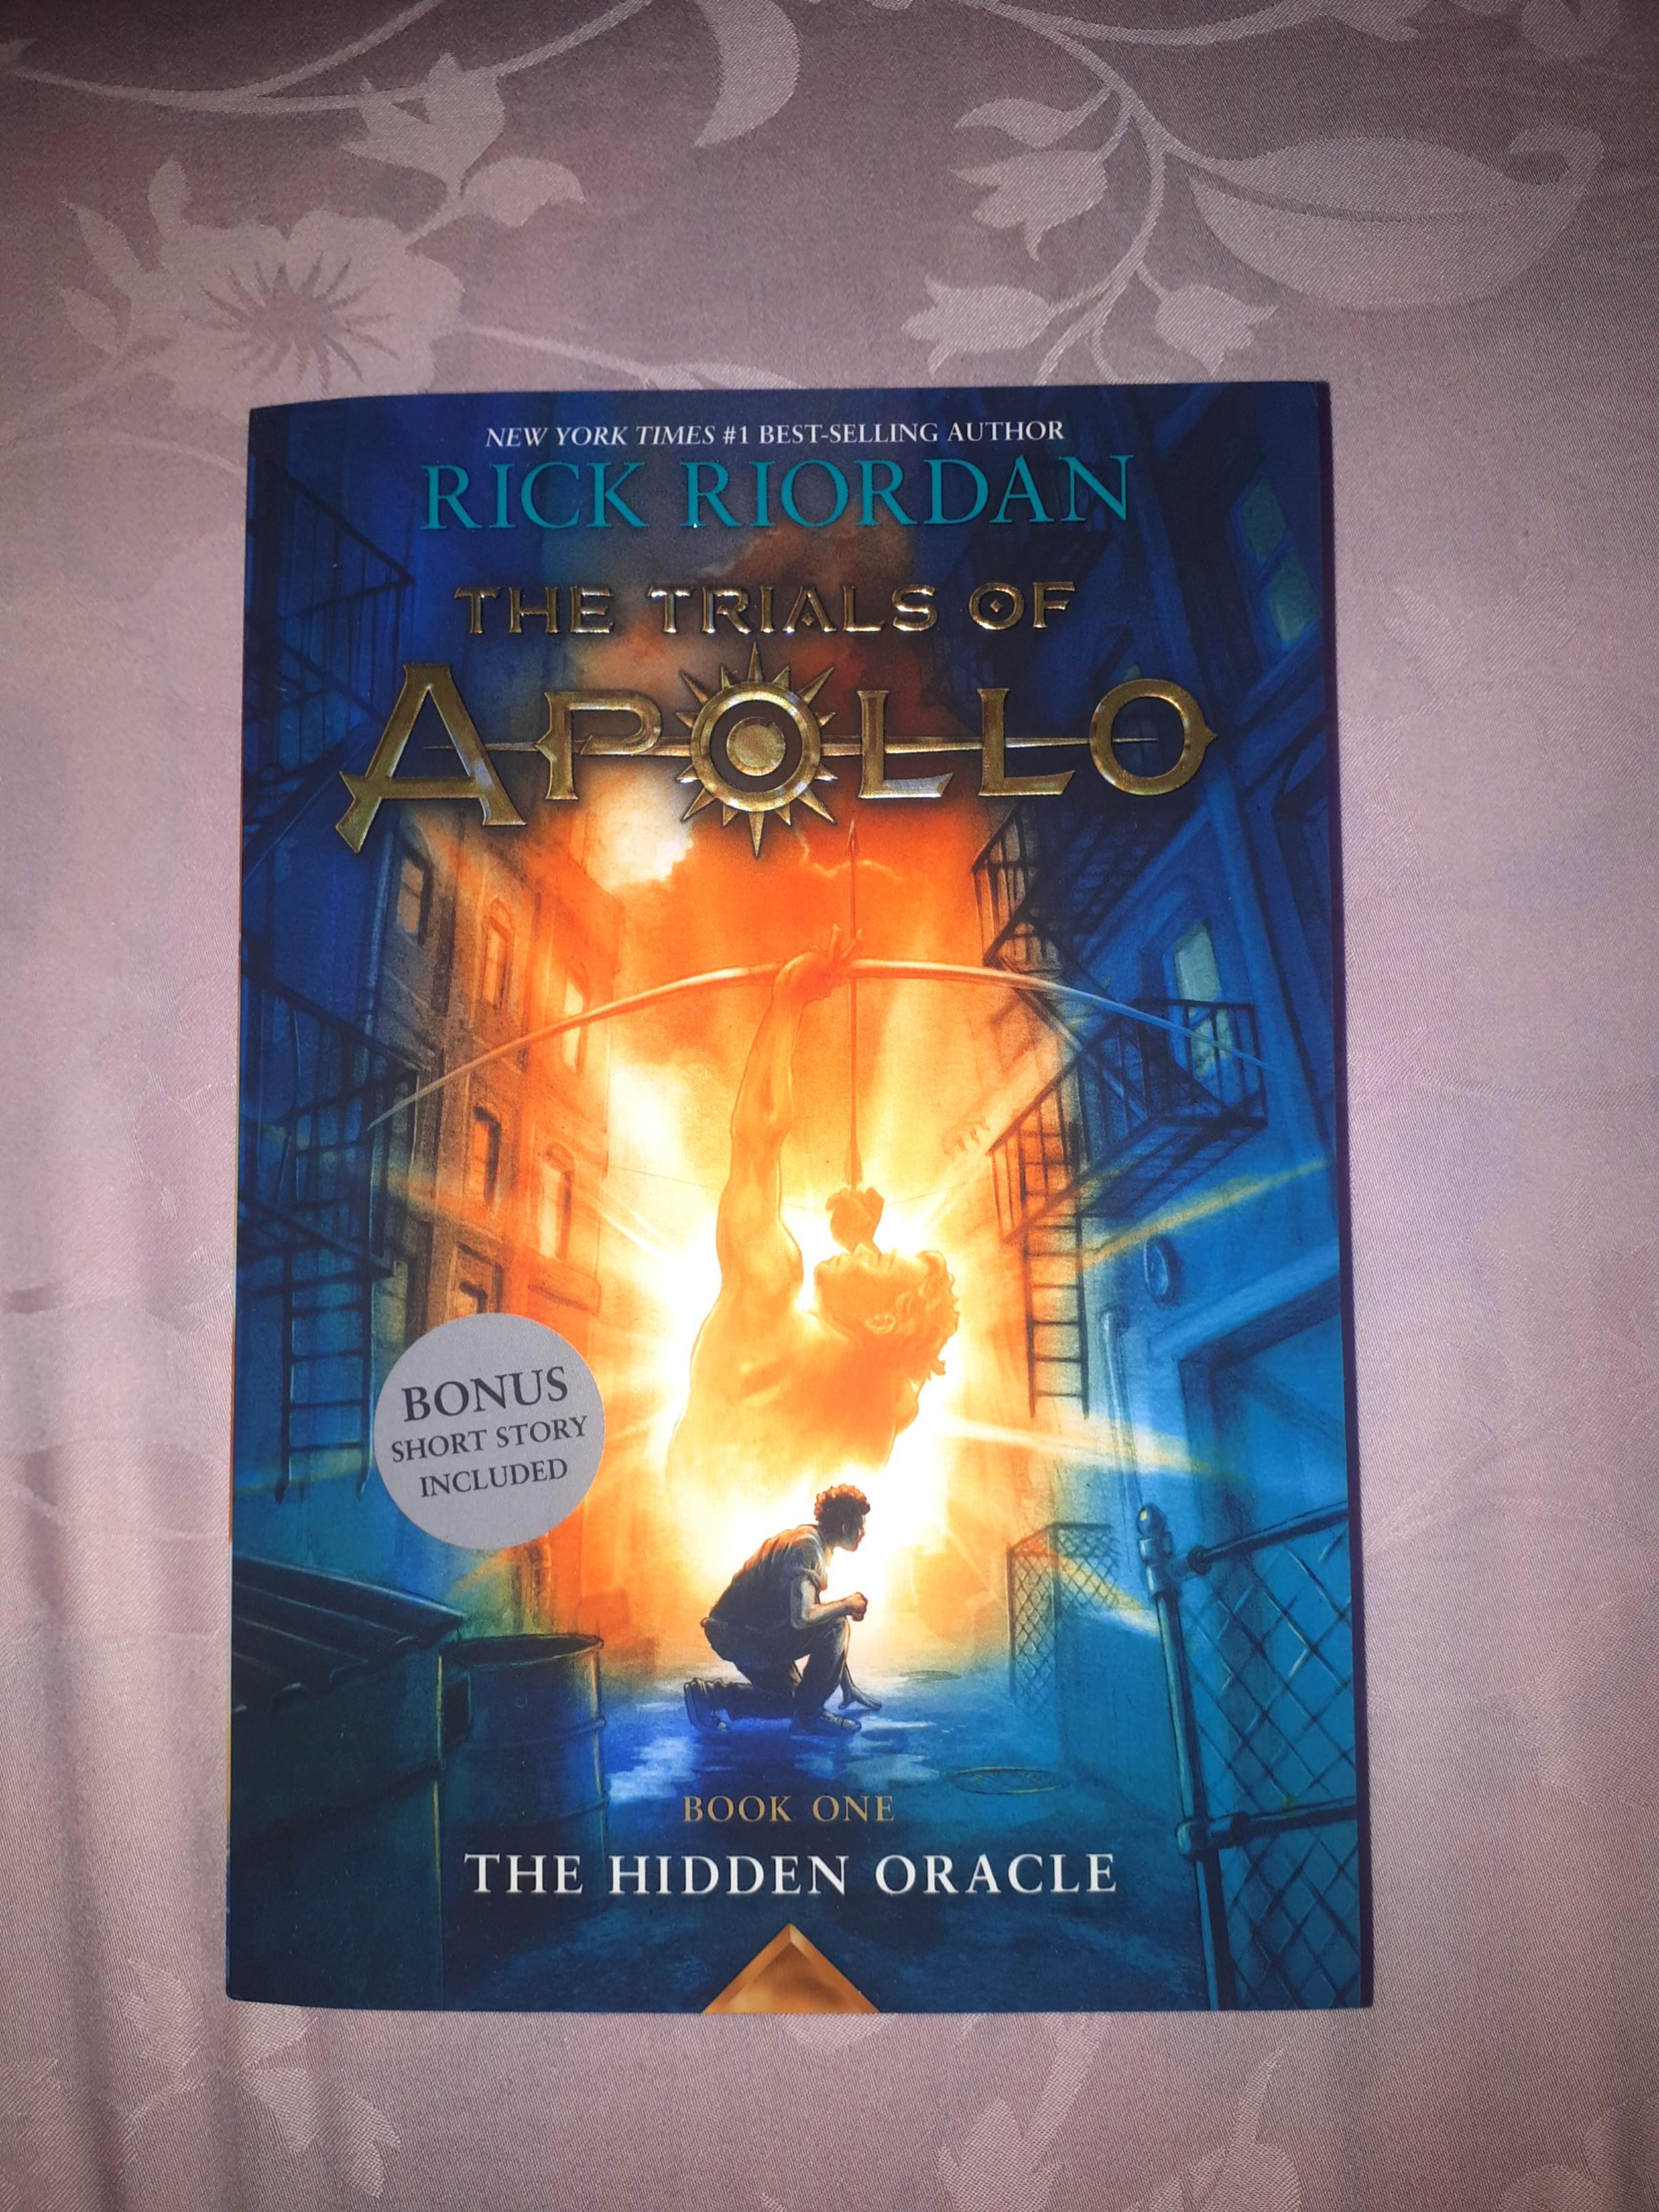 The Trials of Apollo: #1 The Hidden Oracle by Rick Riordan